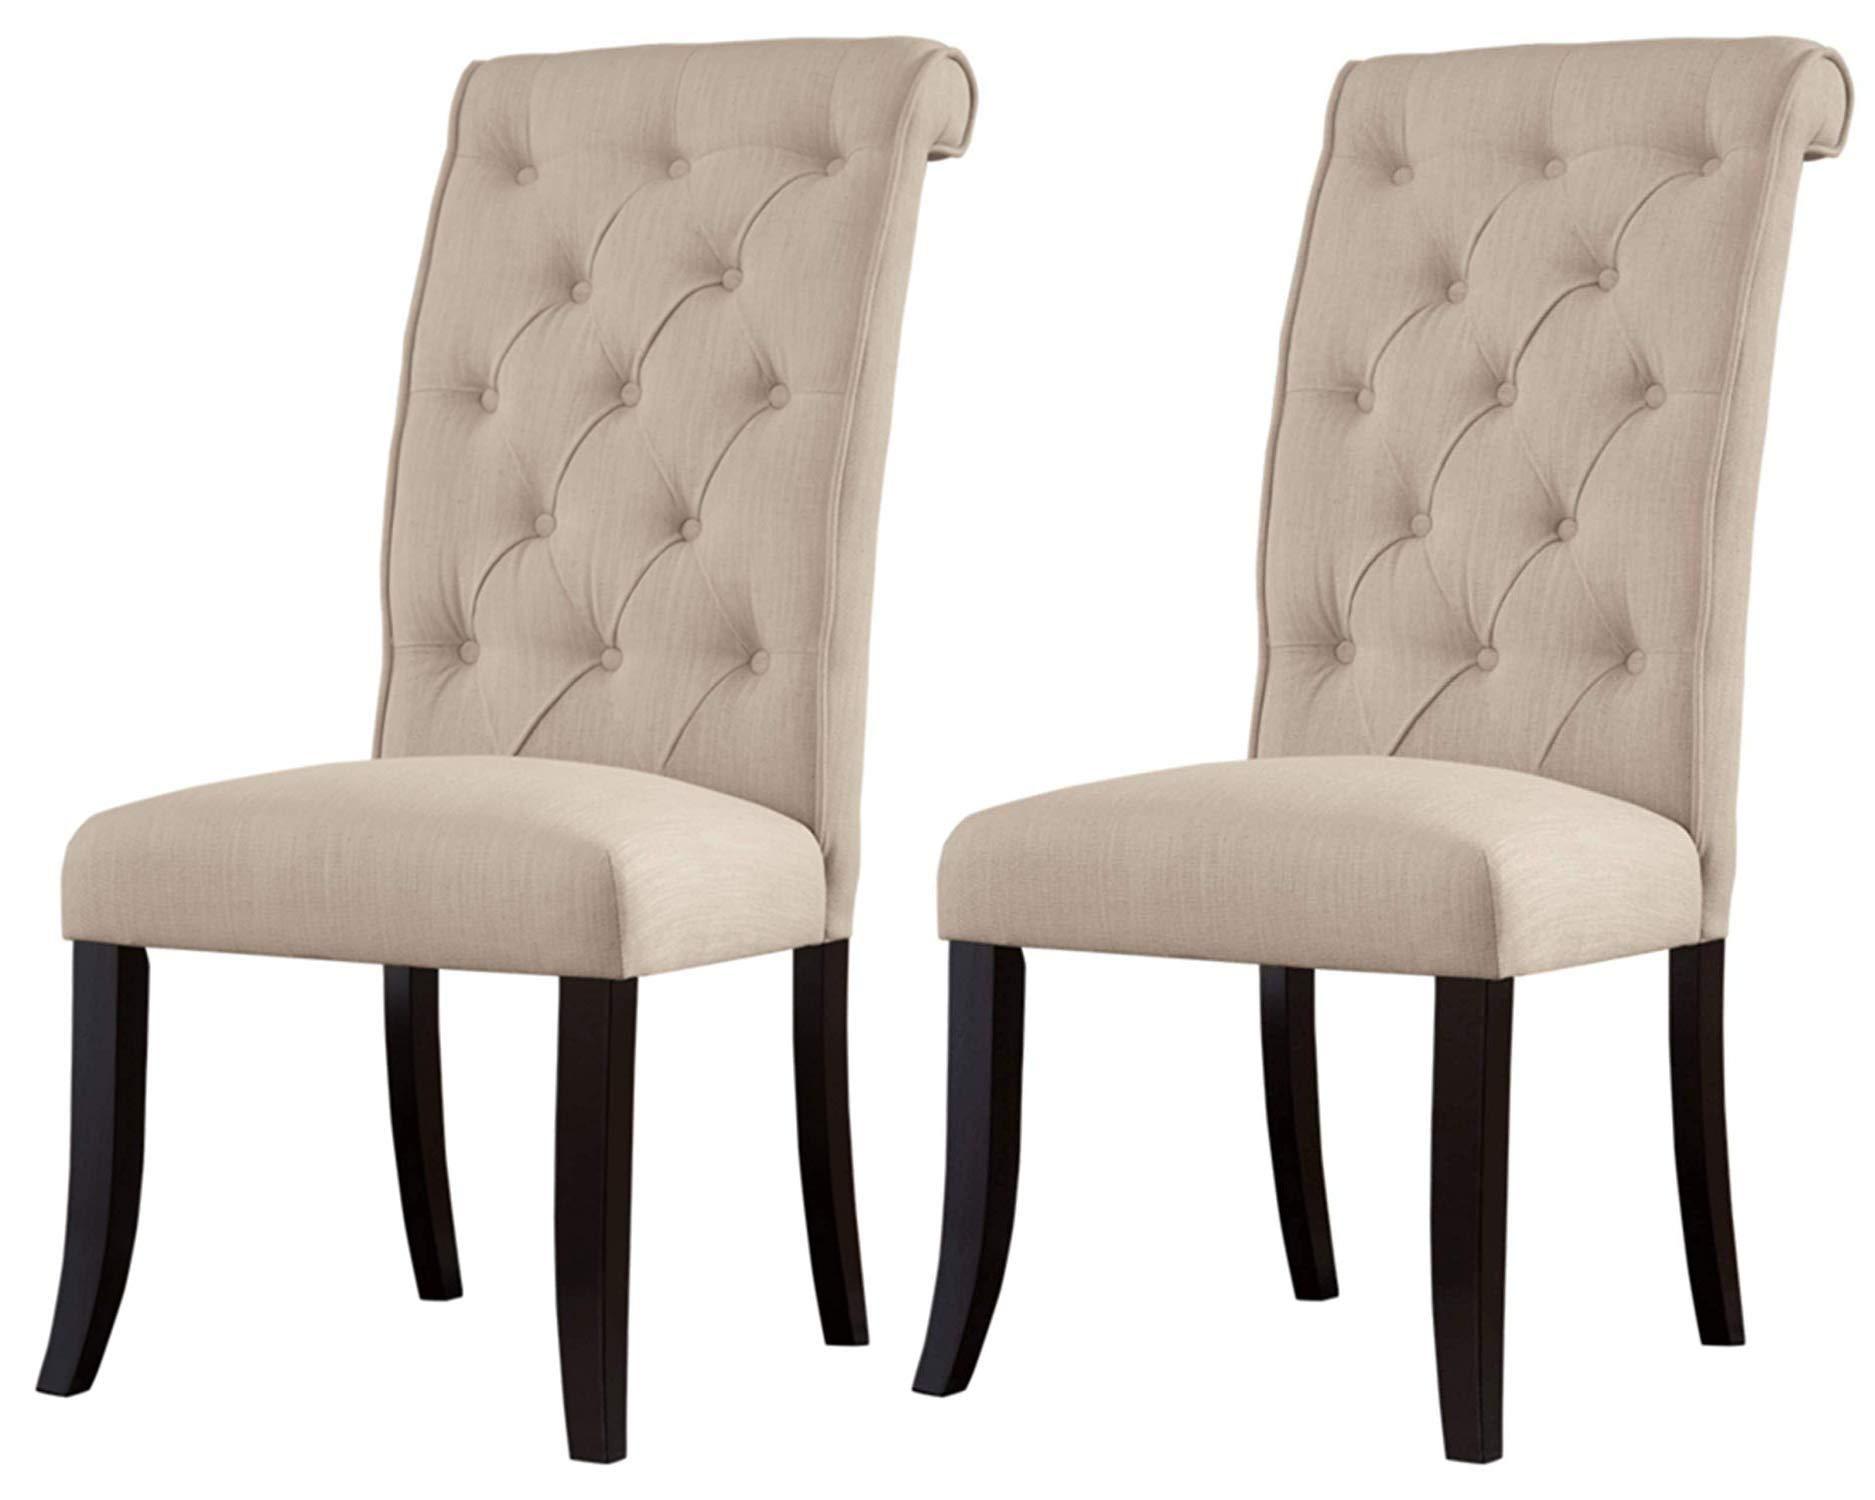 Ashley Furniture Signature Design - Tripton Dining Room Side Chair Set - Upholstered - Vintage Casual - Set of 2 - Linen by Signature Design by Ashley